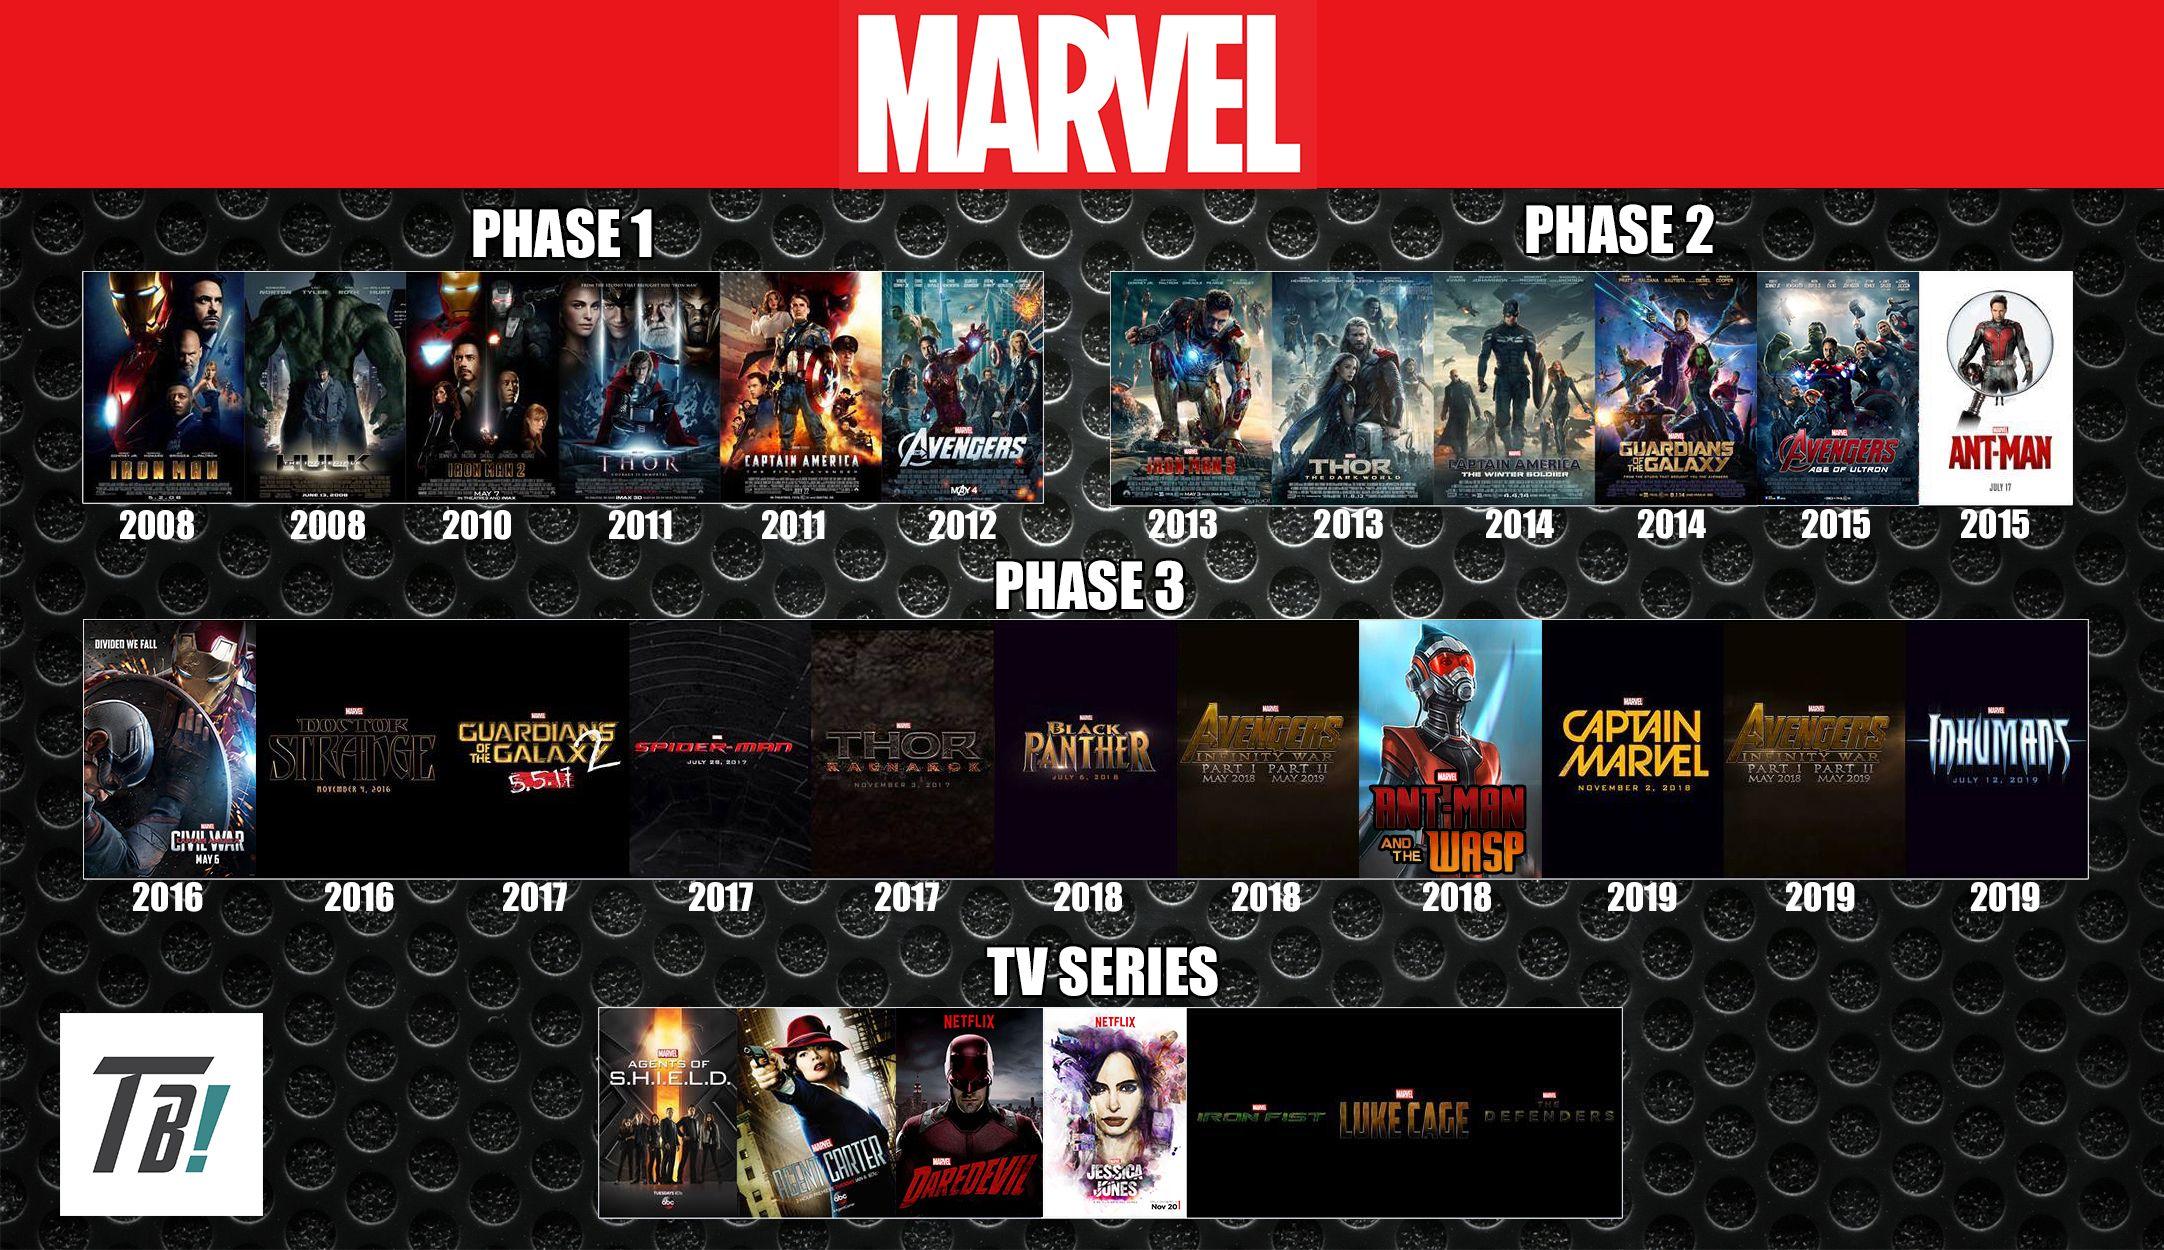 Billedresultat For Marvel Cinematic Marvel Cinematic Universe Timeline Marvel Cinematic Universe Marvel Universe Timeline